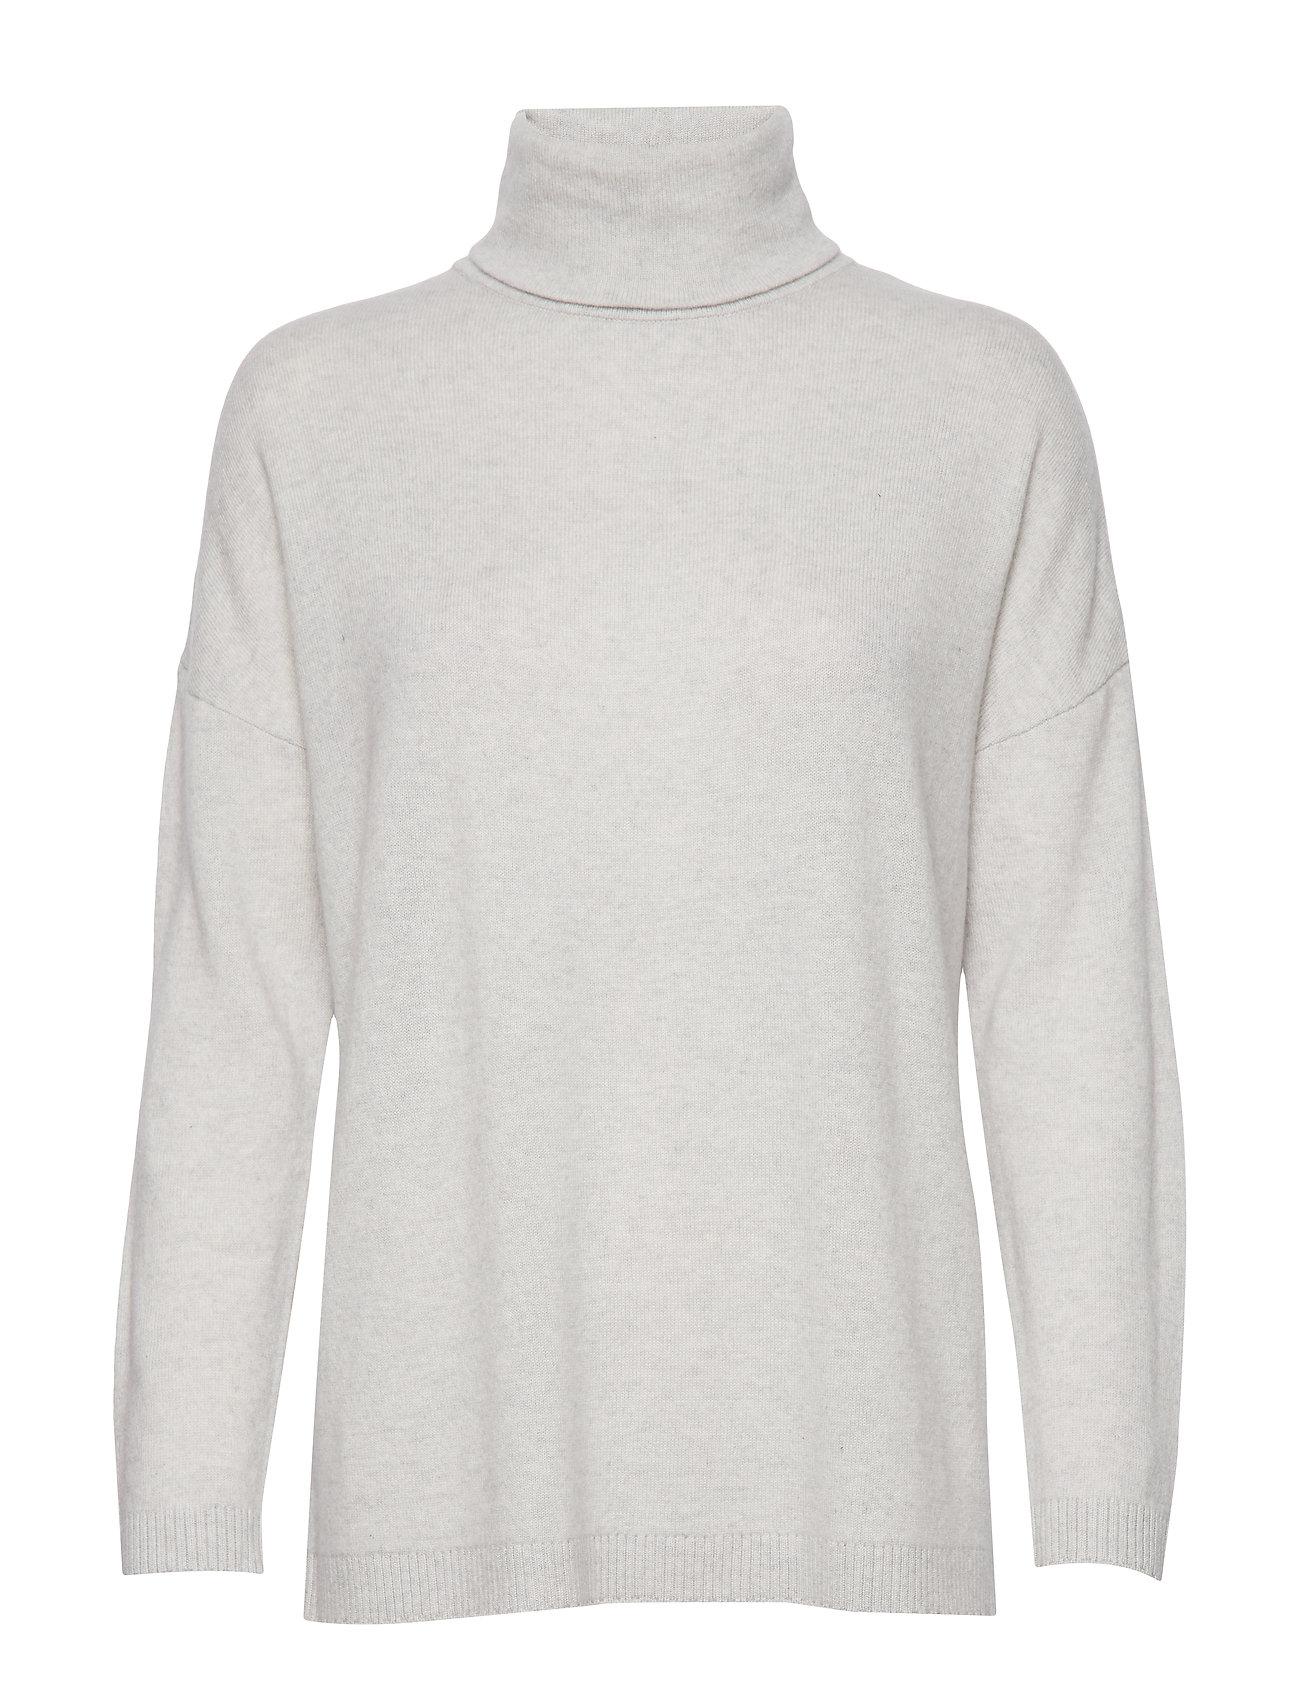 SELECTED Slfeya Cashmere Ls Knit Rollneck B Rollkragenpullover Poloshirt Grau SELECTED FEMME